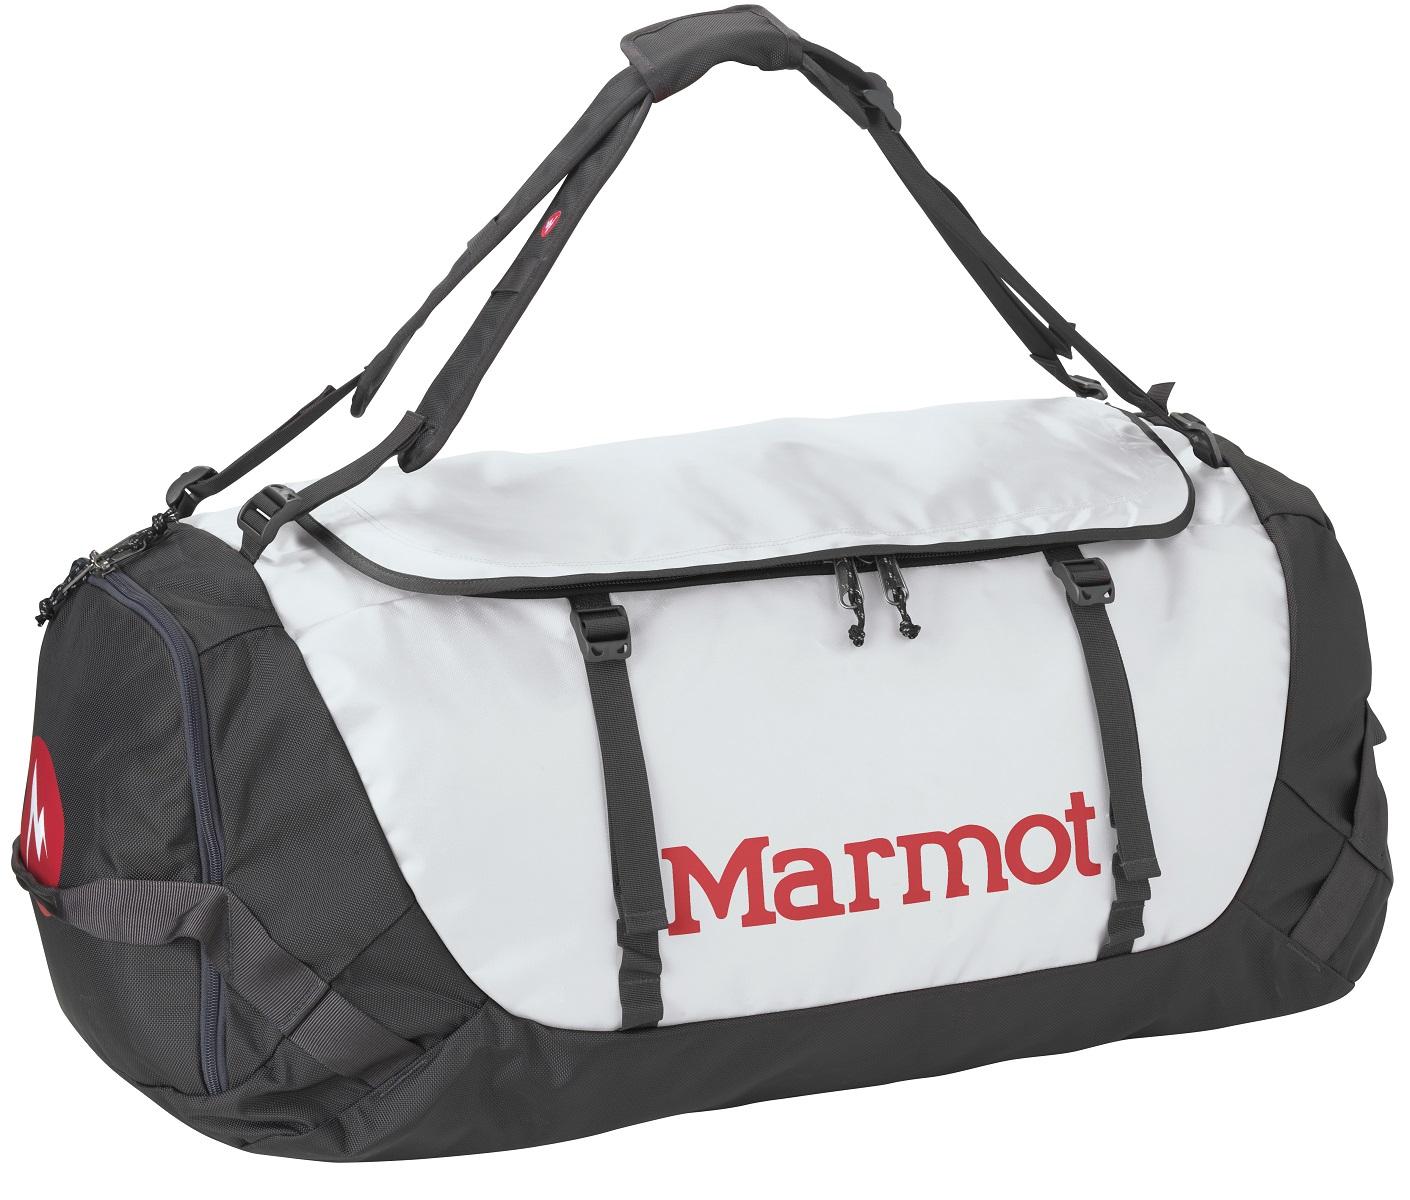 Сумка дорожная Marmot Long Hauler Duffel Bag Large, цвет: серый, 75 л